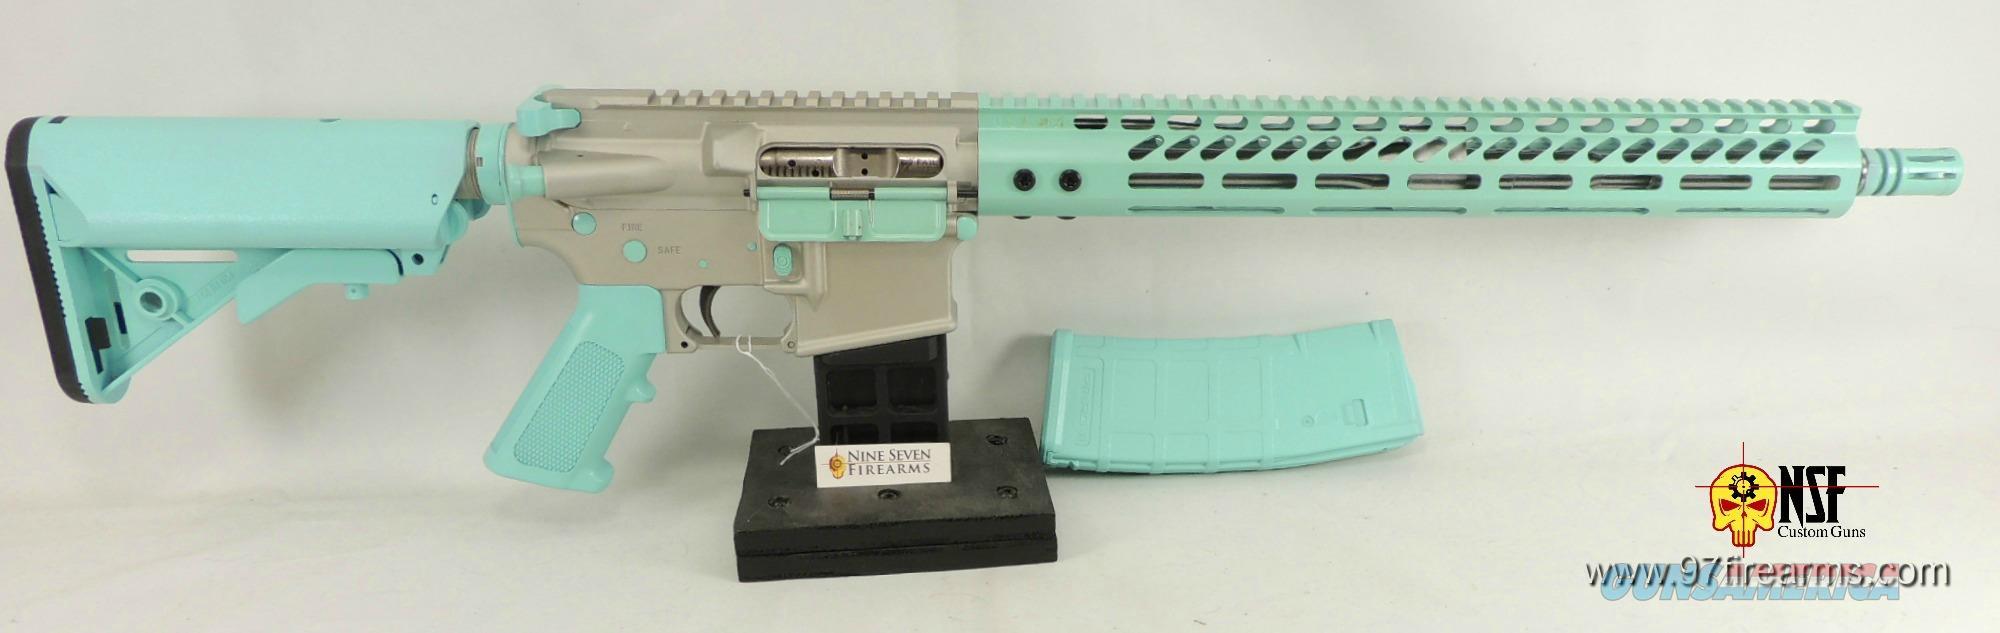 NSF Custom Guns, Robins Egg Cerakote, AR-15, SS Barrel, FZ BCG